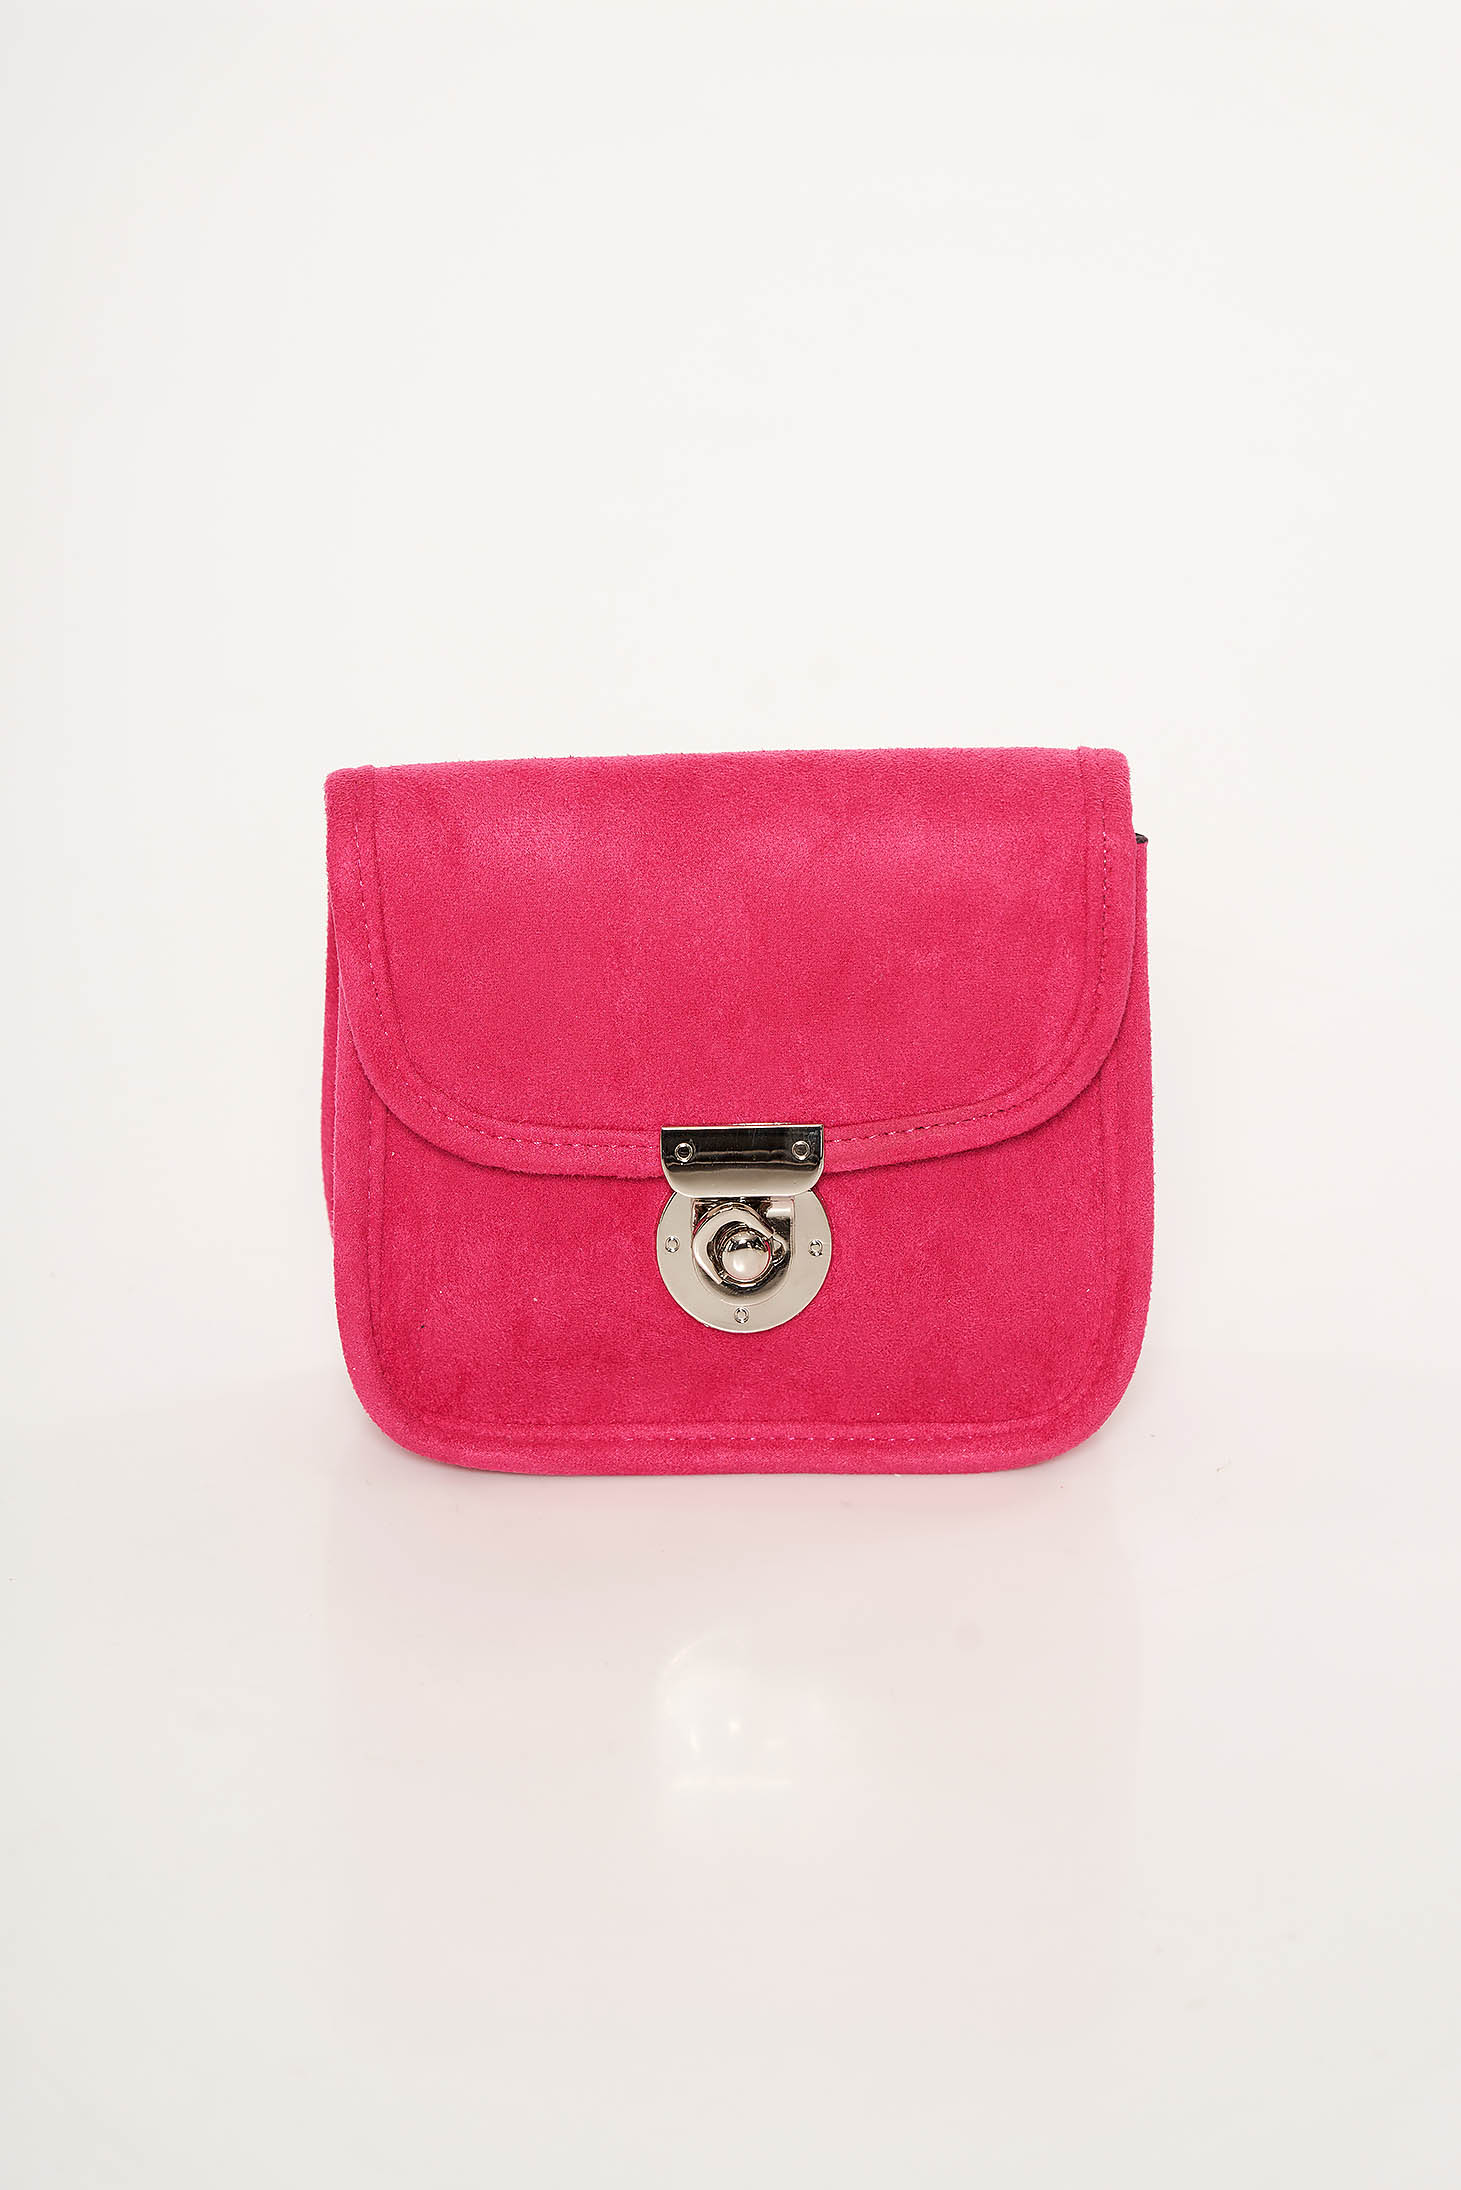 Geanta dama roz Top Secret din material catifelat cu maner lung tip lantisor